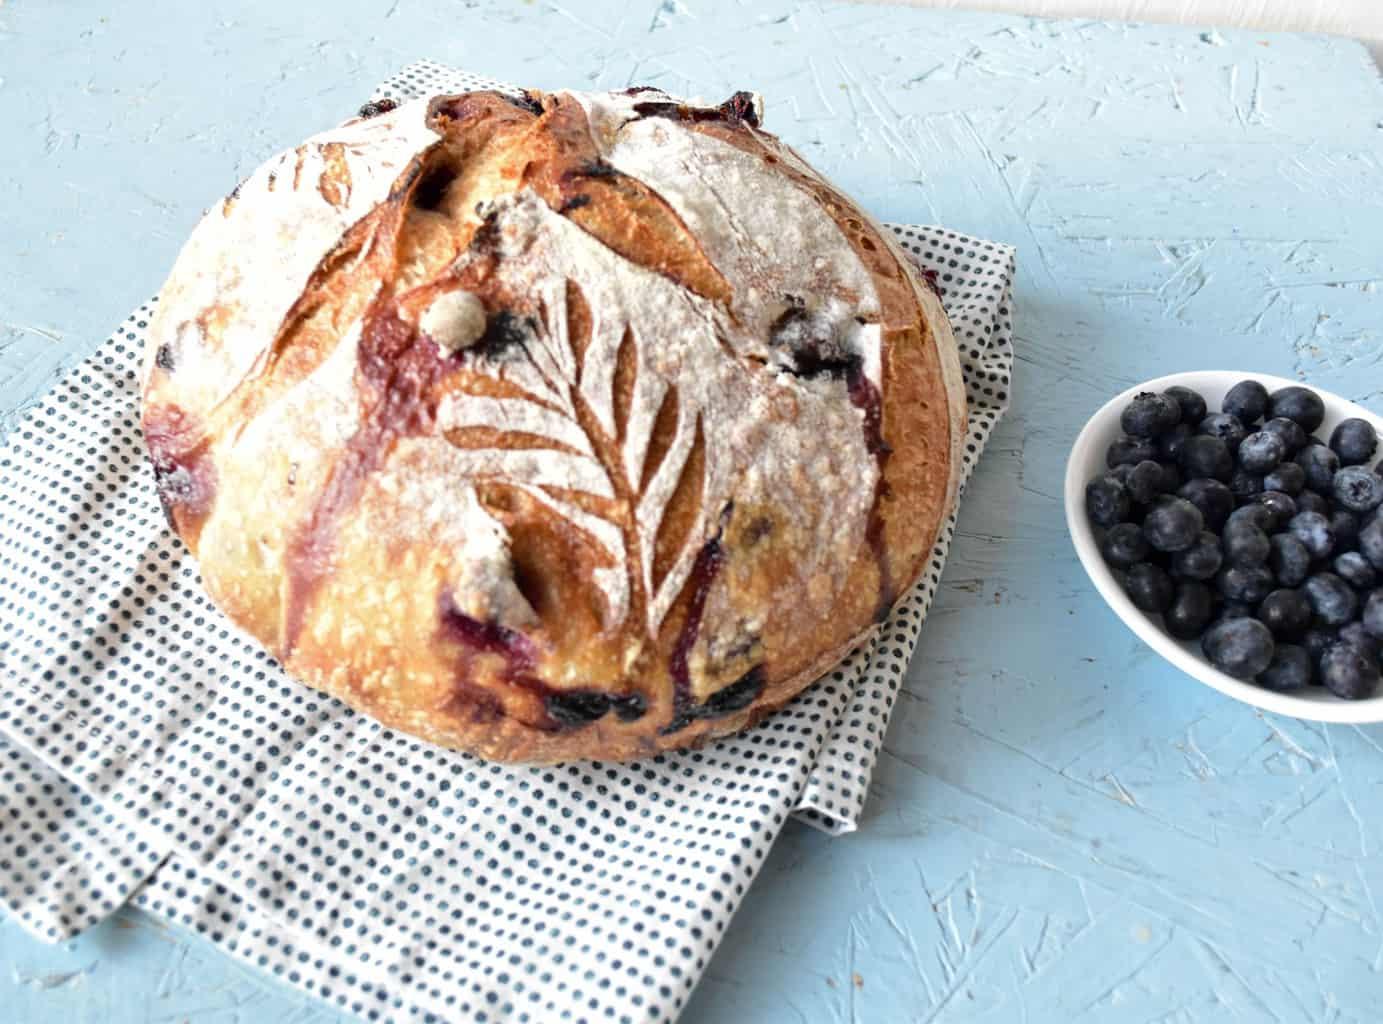 "<img src=""https://cdn.shortpixel.ai/client/q_glossy,ret_img,w_4096,h_3032/Sourdough bread.jpg"" alt=""Blueberry rye sourdough bread 3 "">"